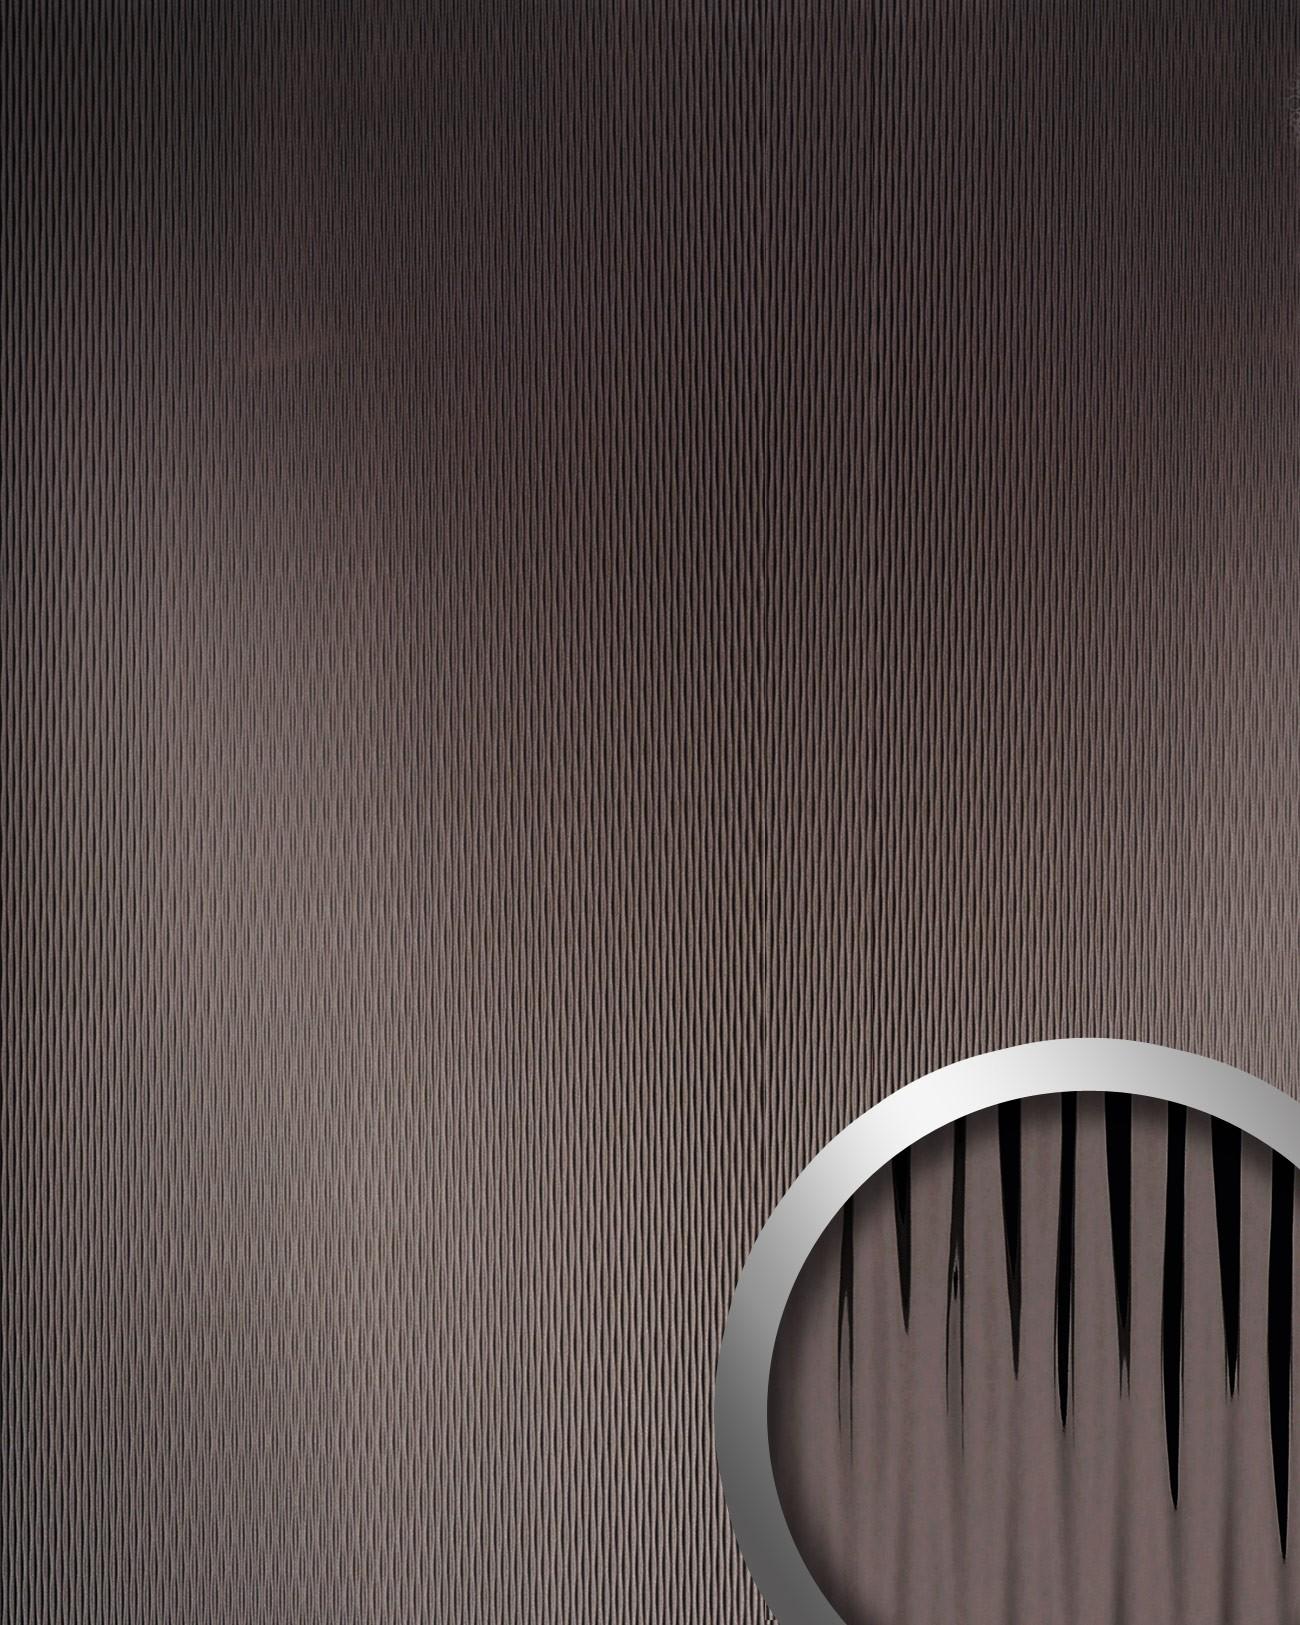 Wandbekleding panelen voor badkamer WallFace 16480 MOTION ONE keuken ...